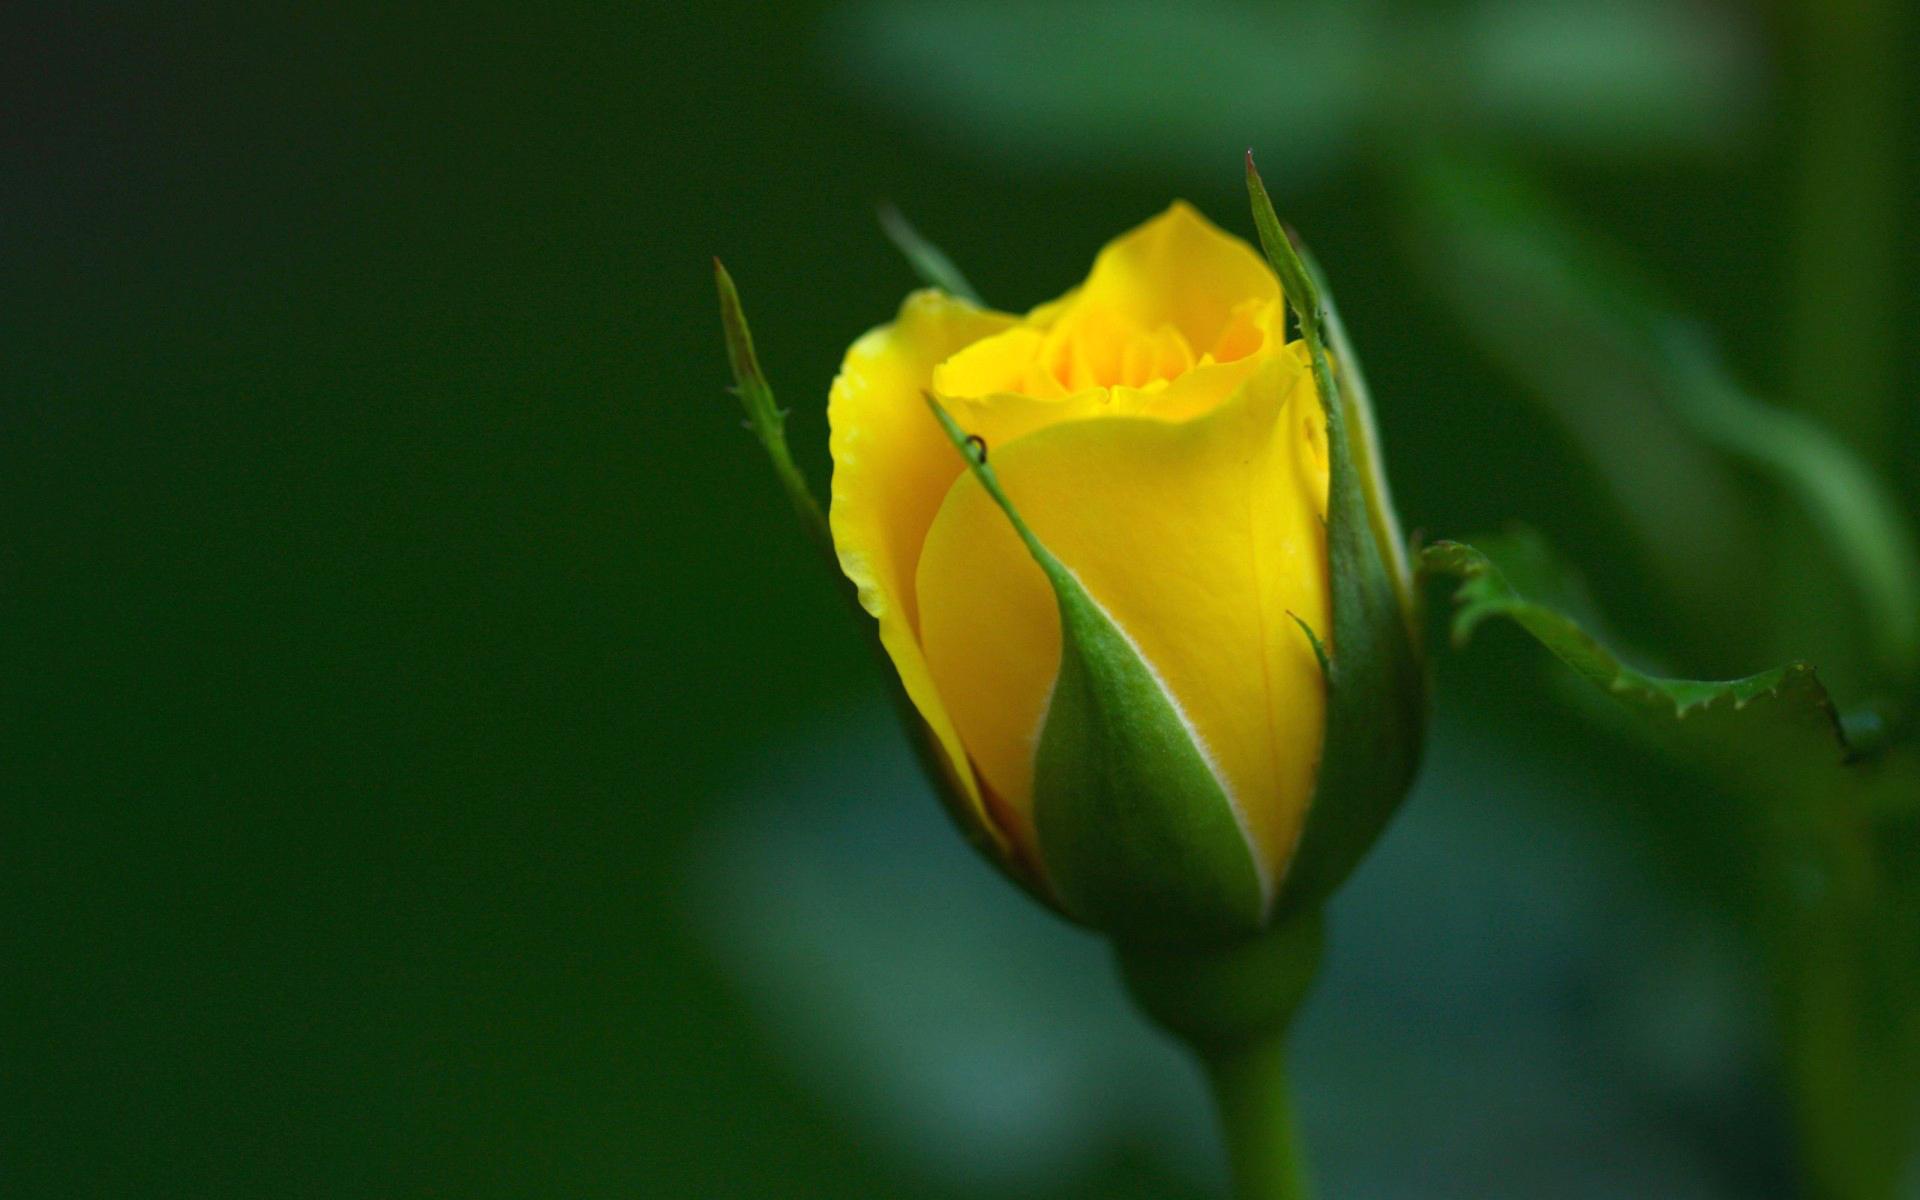 yellow love rose - HD1920×1200